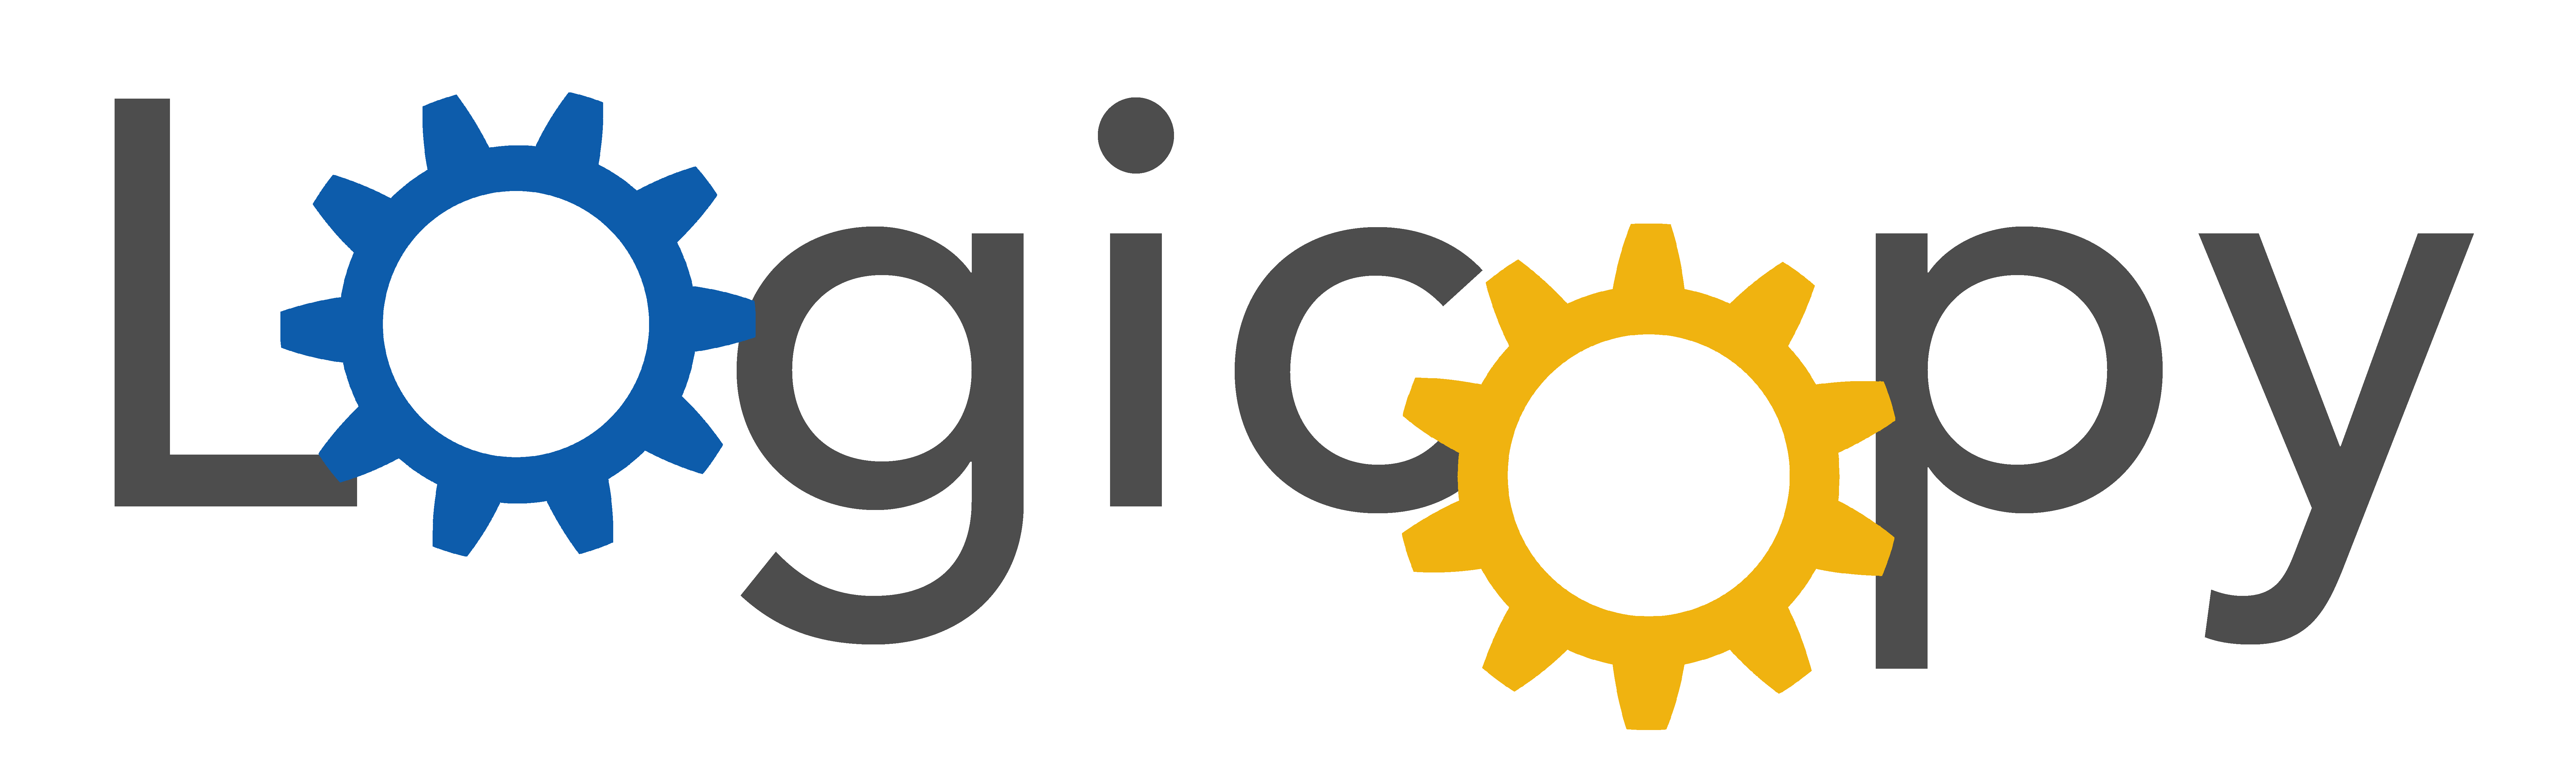 Logicopy Logo